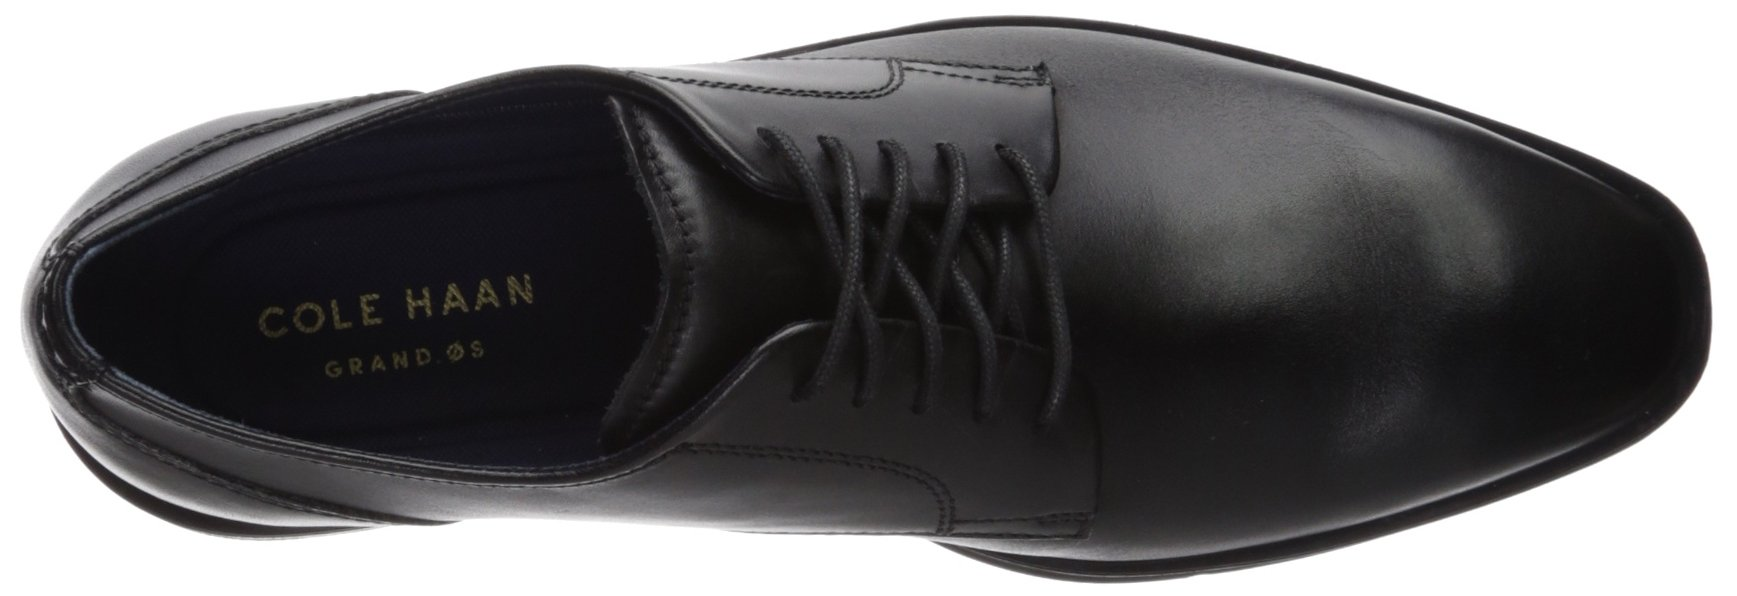 Cole Haan Men's Dawes Grand Plain Toe Oxford, Black, 11 Medium US by Cole Haan (Image #8)